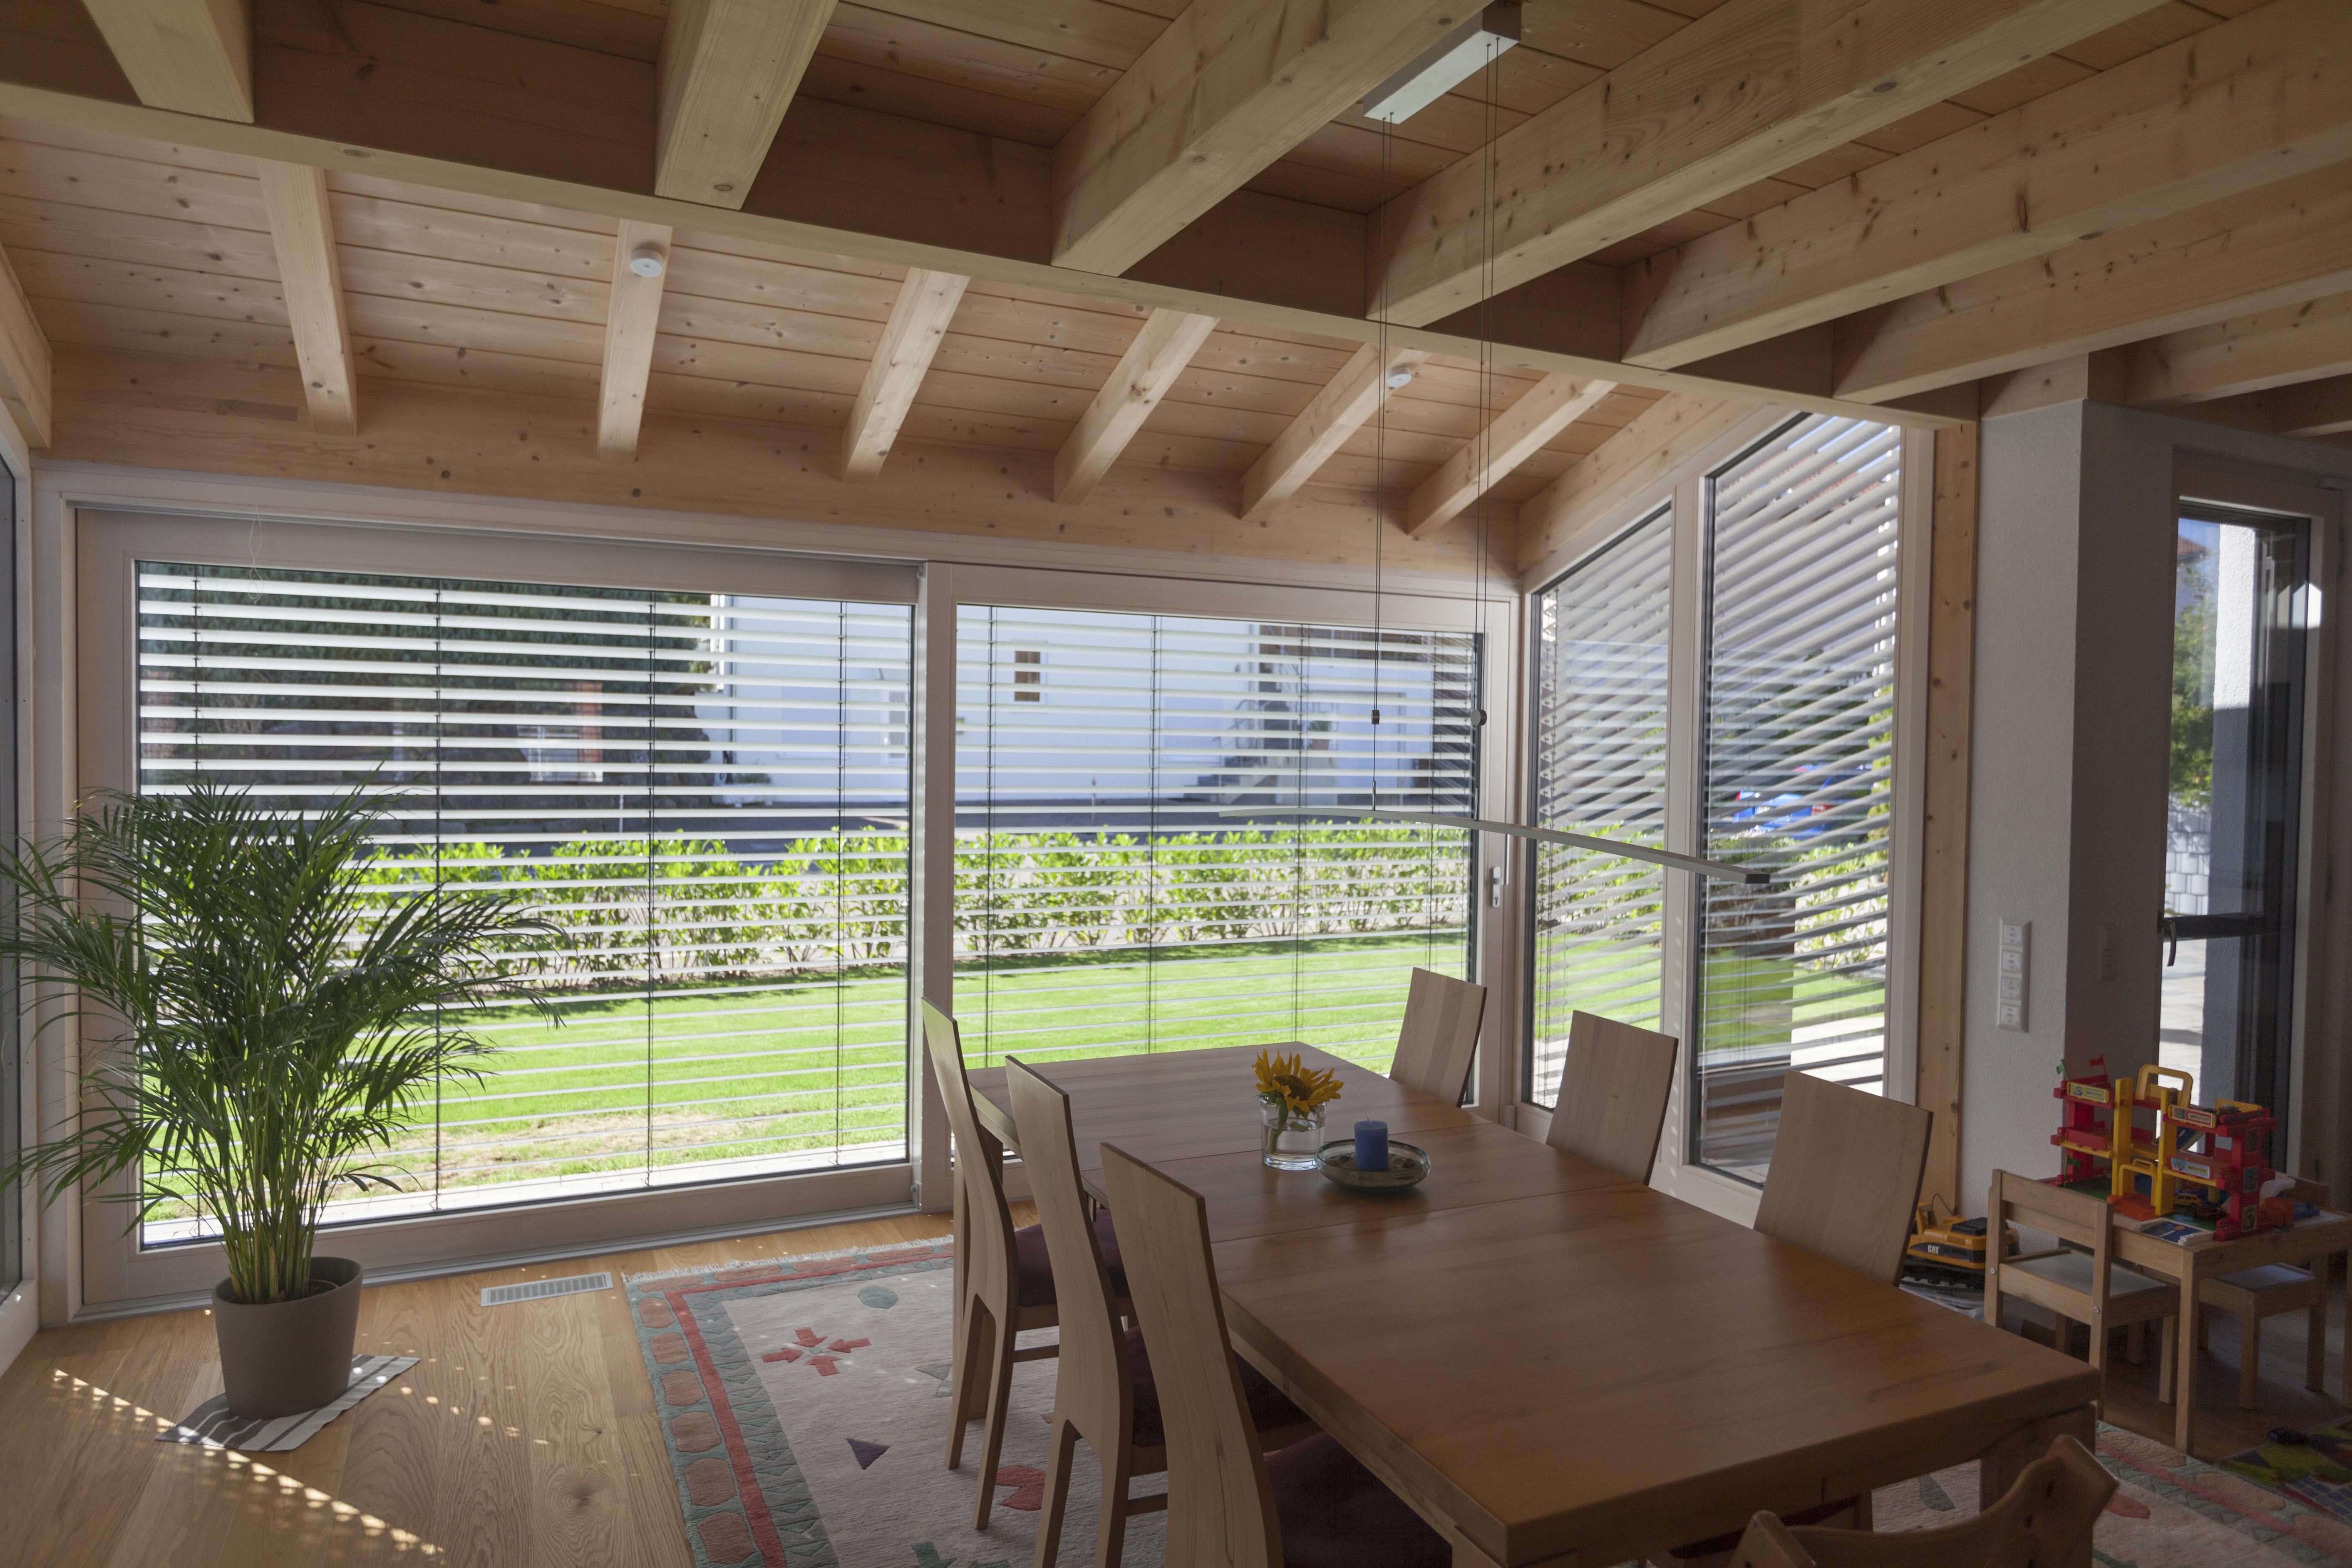 Holz alu fenster vorteile  Holz-Aluminium-Fenster - Pforzheimer Fensterbau